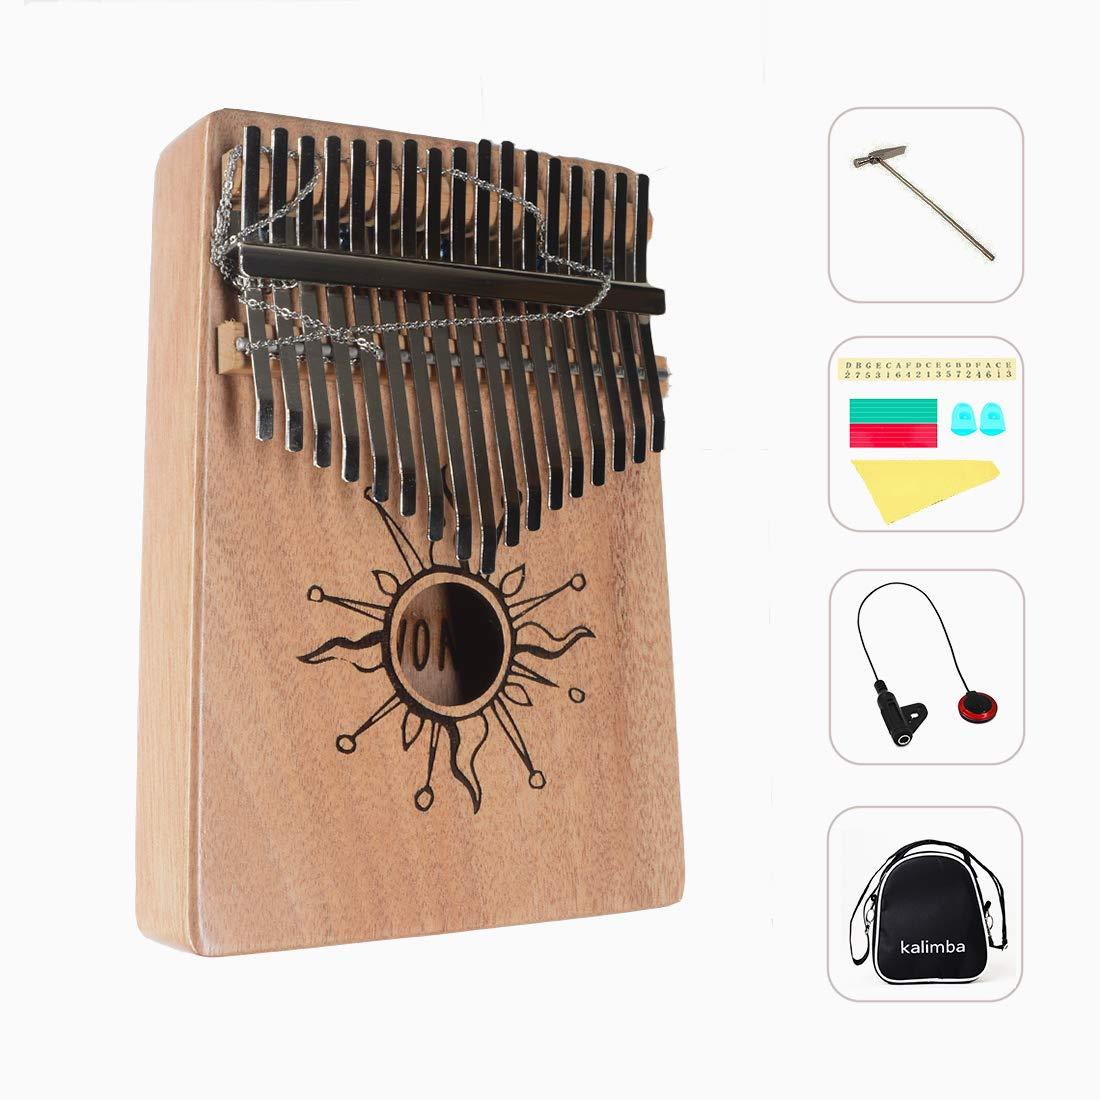 AOVOA Thumb Piano, 17 key Kalimba, Finger Piano Mbira, Mahogany Body Kalimba with Tuning Hammer, Pickup, Finger Guards, Carry Bag and Key stickers, Ideal Gift for Music Fans by AOVOA (Image #1)